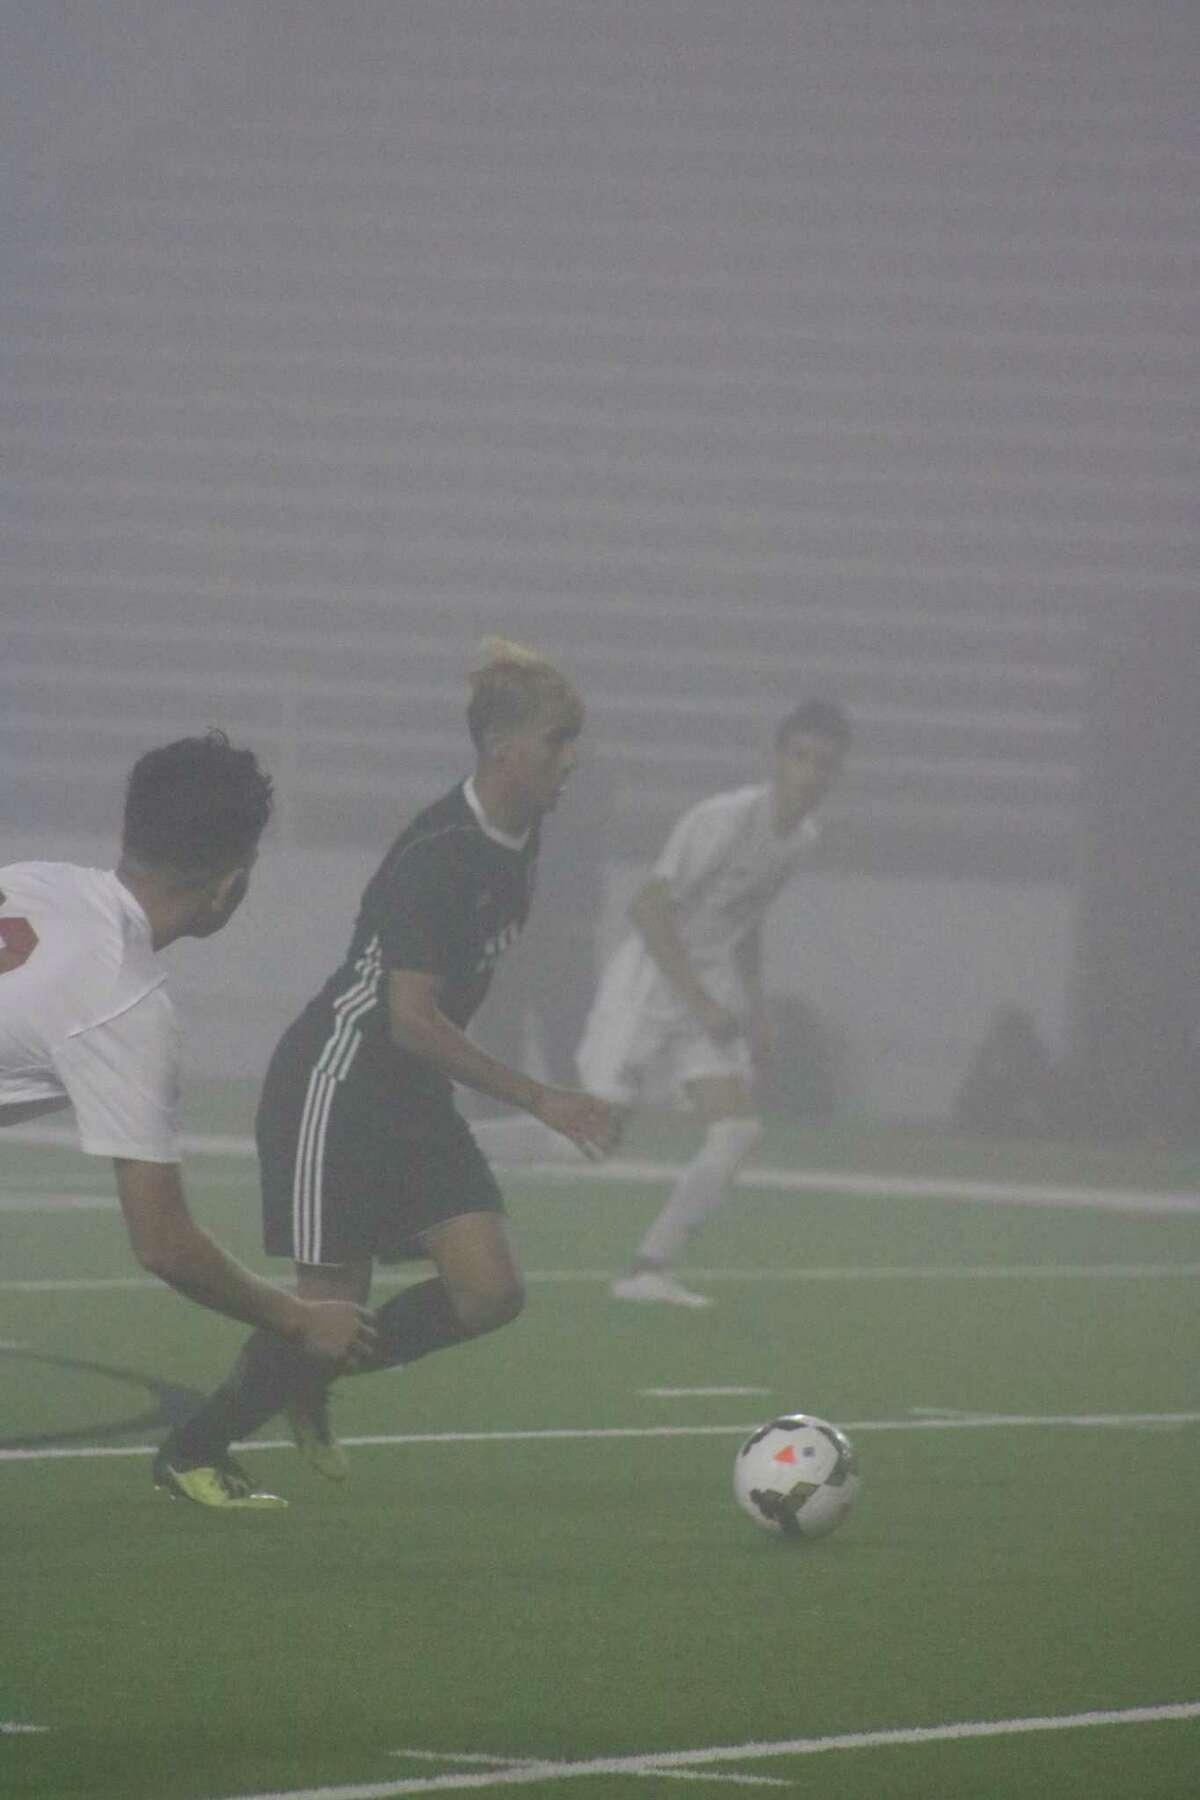 Amidst Wednesday night's dense fog at Veterans Memorial Stadium, a Pasadena player dribbles the ball towards Dobie's goal in second-half action.